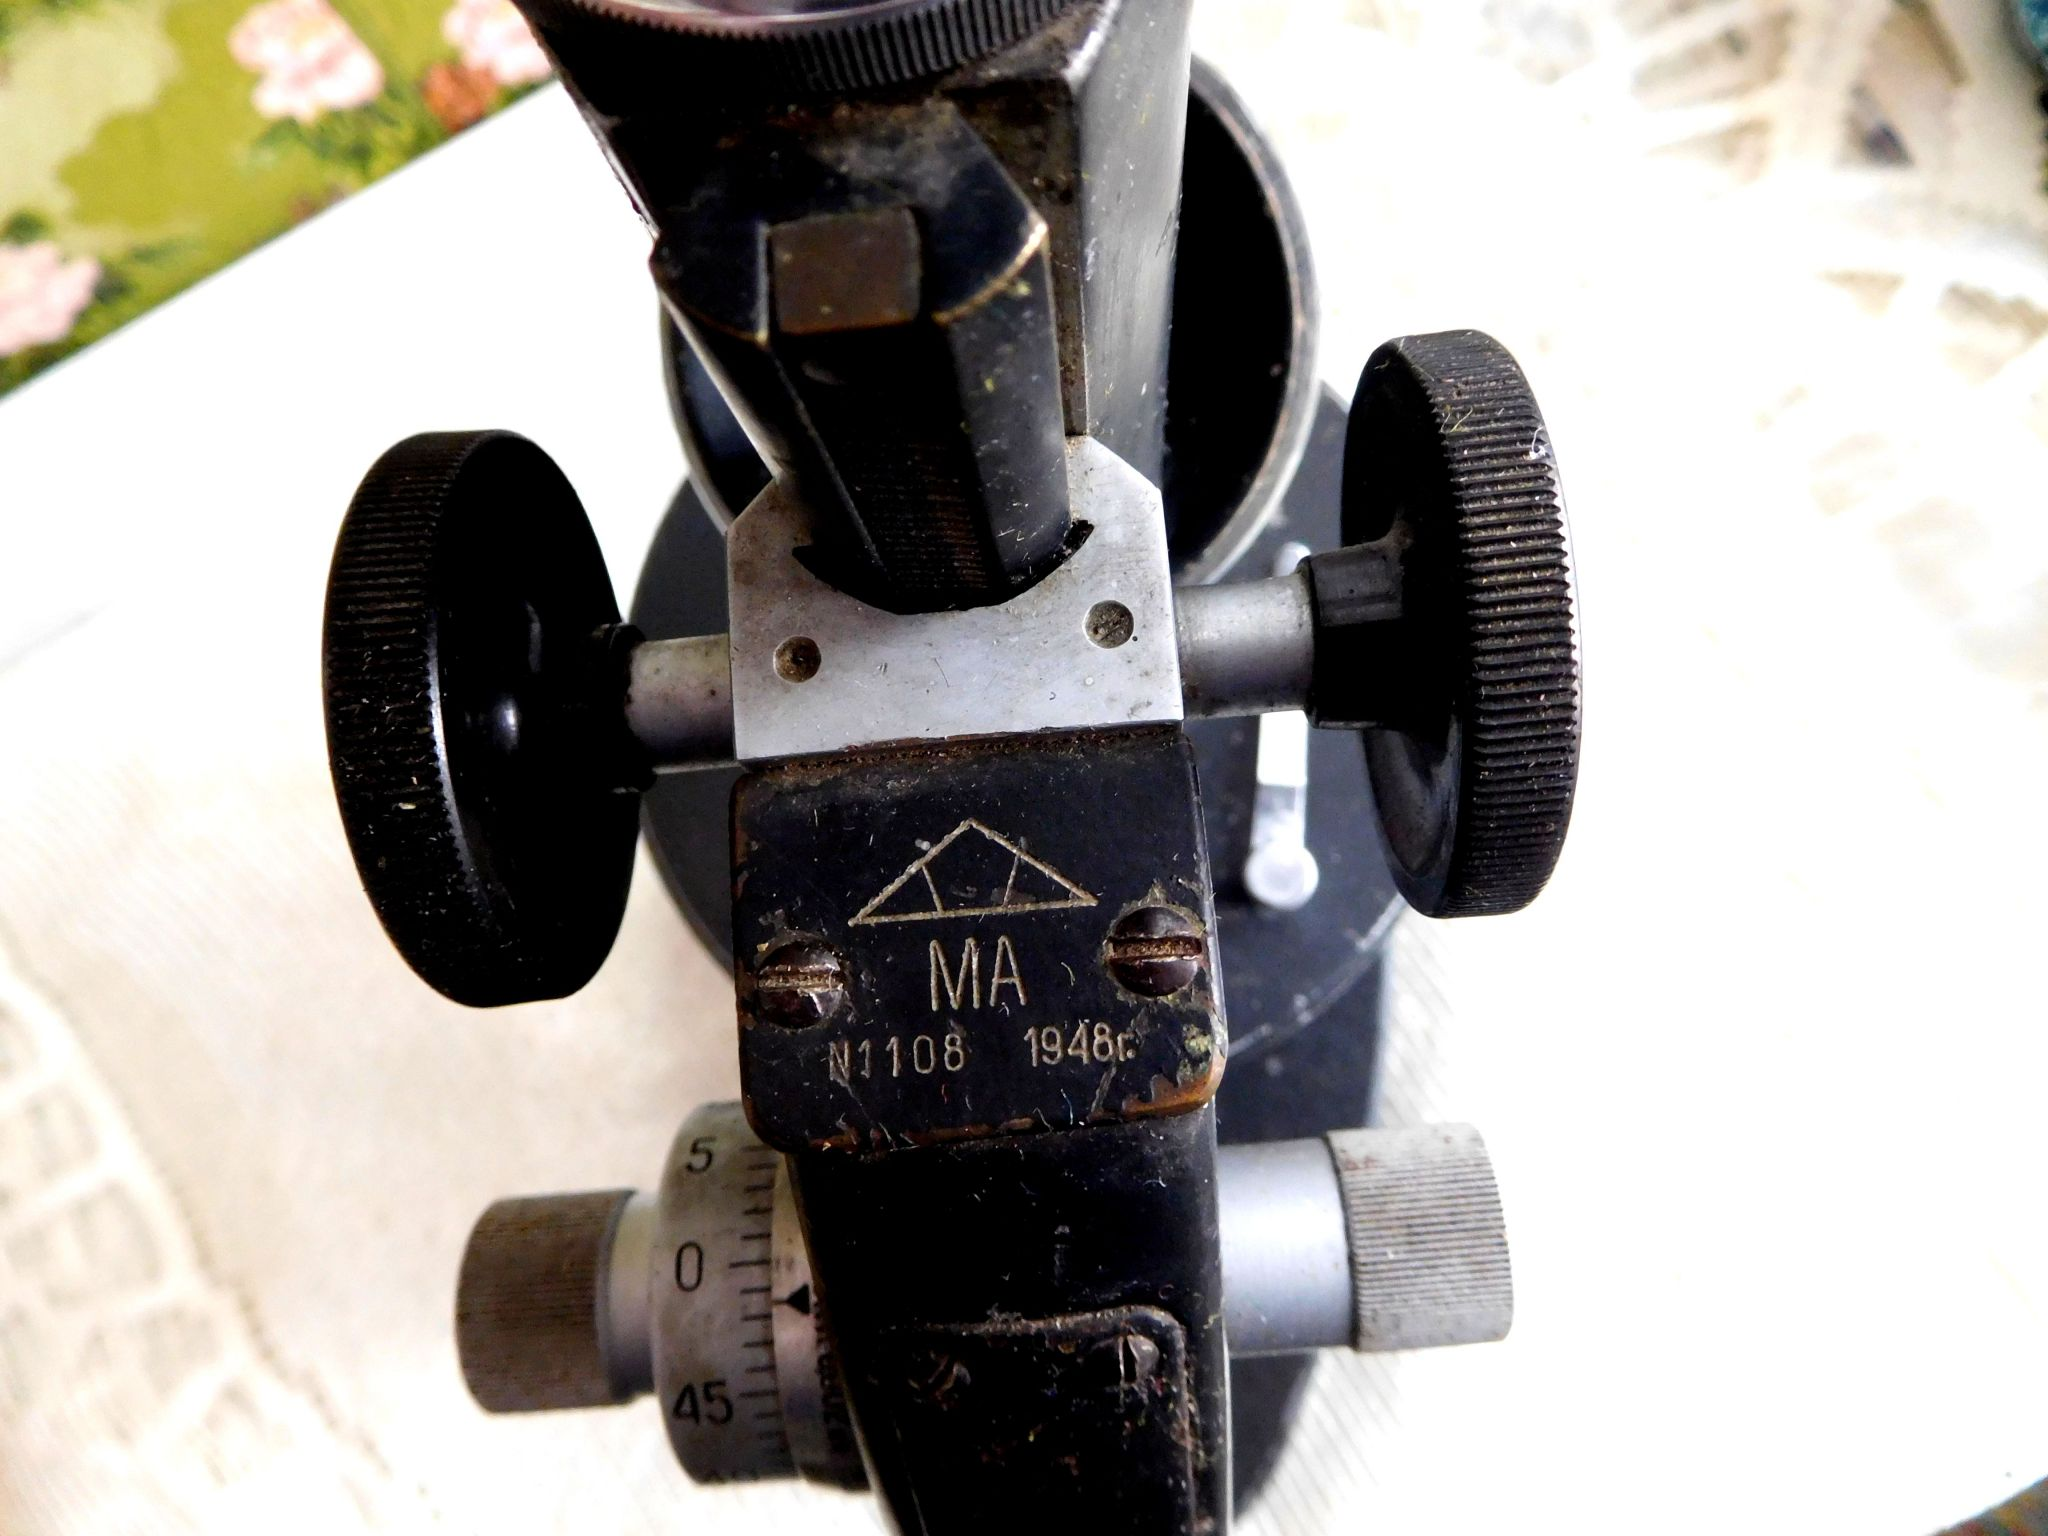 микроскоп ма